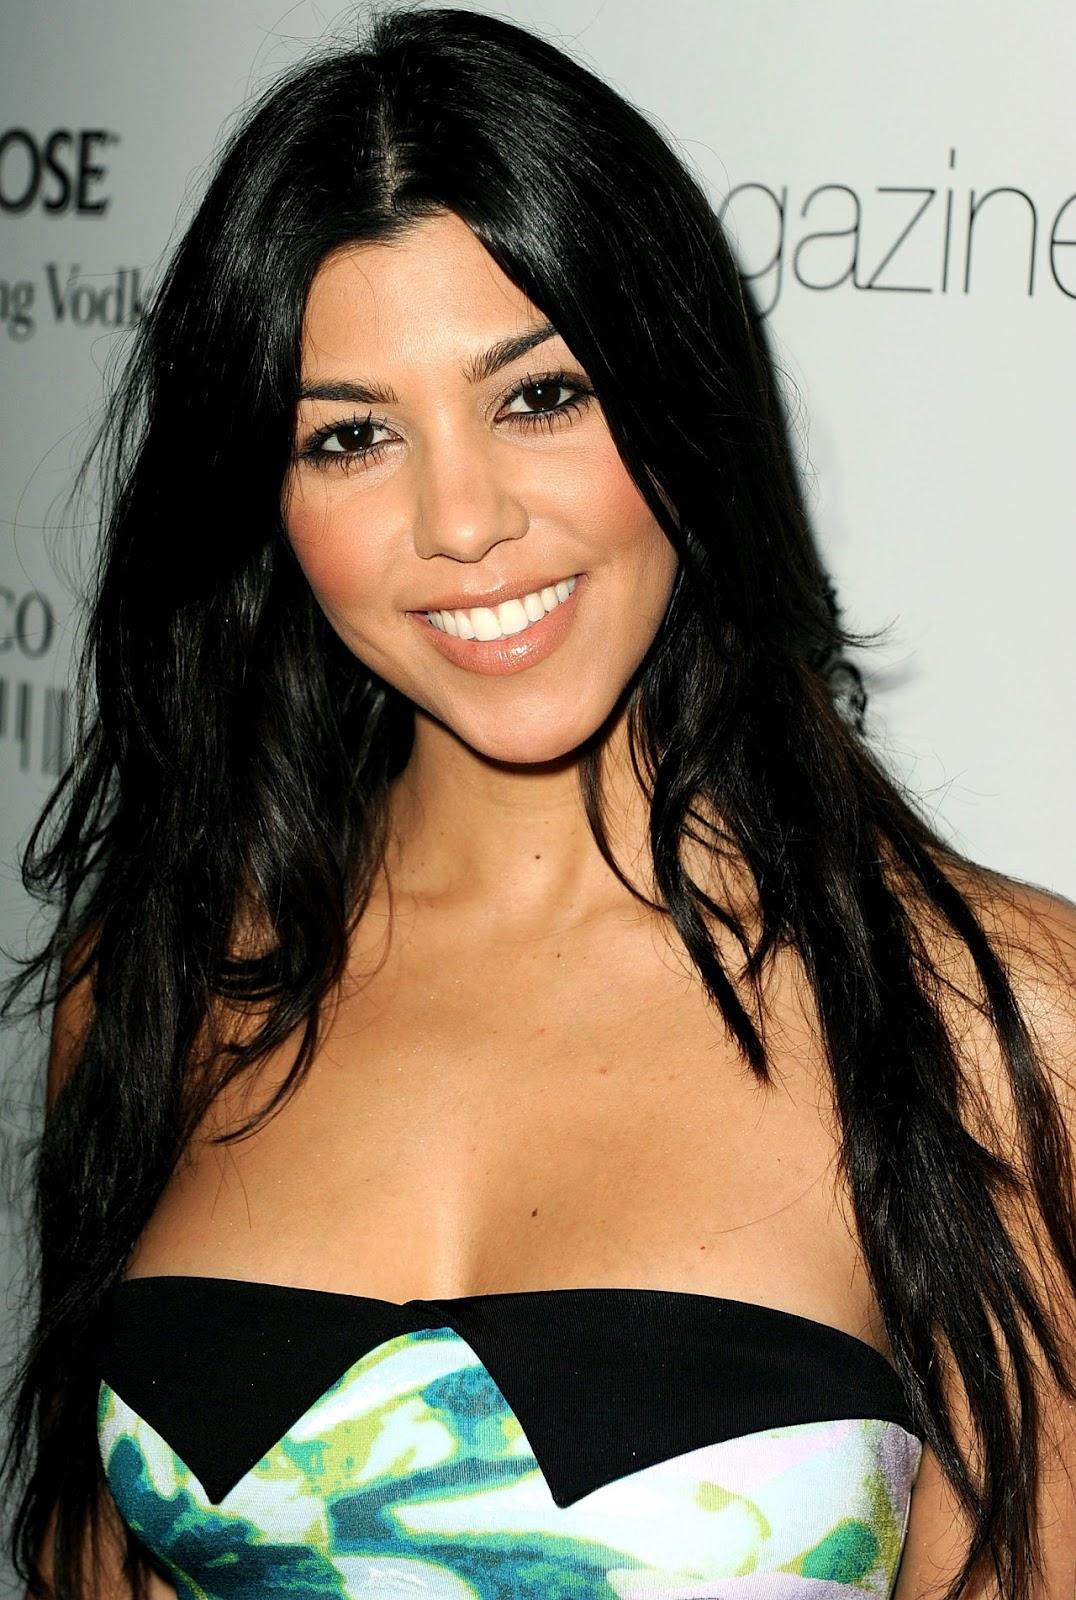 http://4.bp.blogspot.com/-4uJTLVYVzKU/T_sz3uuPqAI/AAAAAAAAEO8/SNm-eXy3T3w/s1600/Kourtney+Kardashian(4).jpg